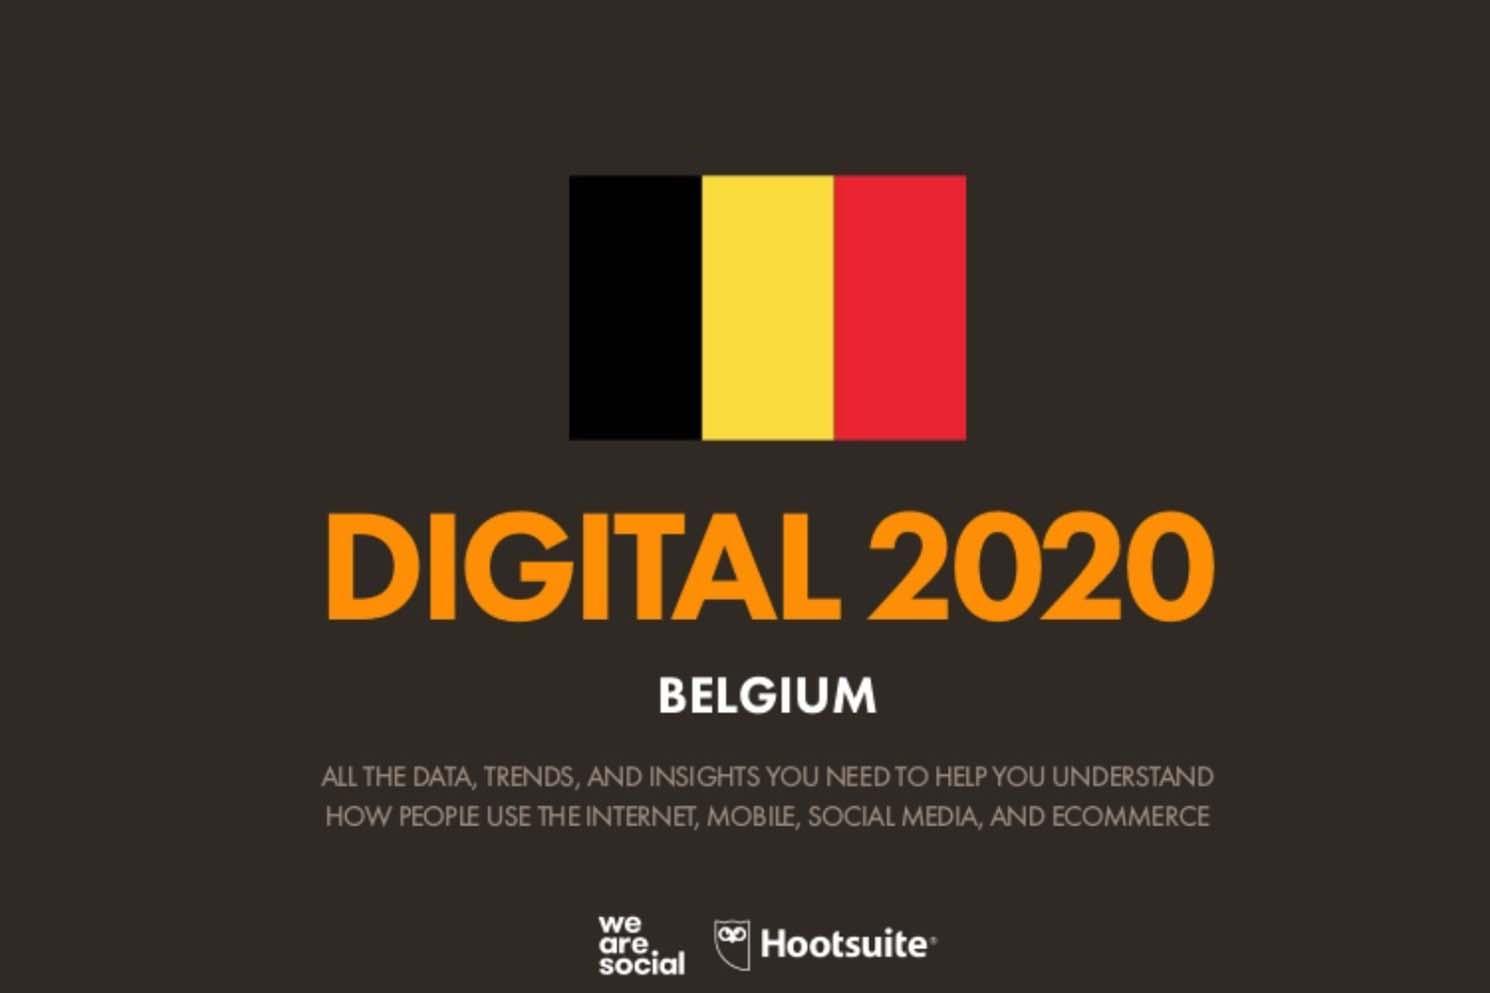 Cijfers over internet, sociale media en e-commerce in België 2020